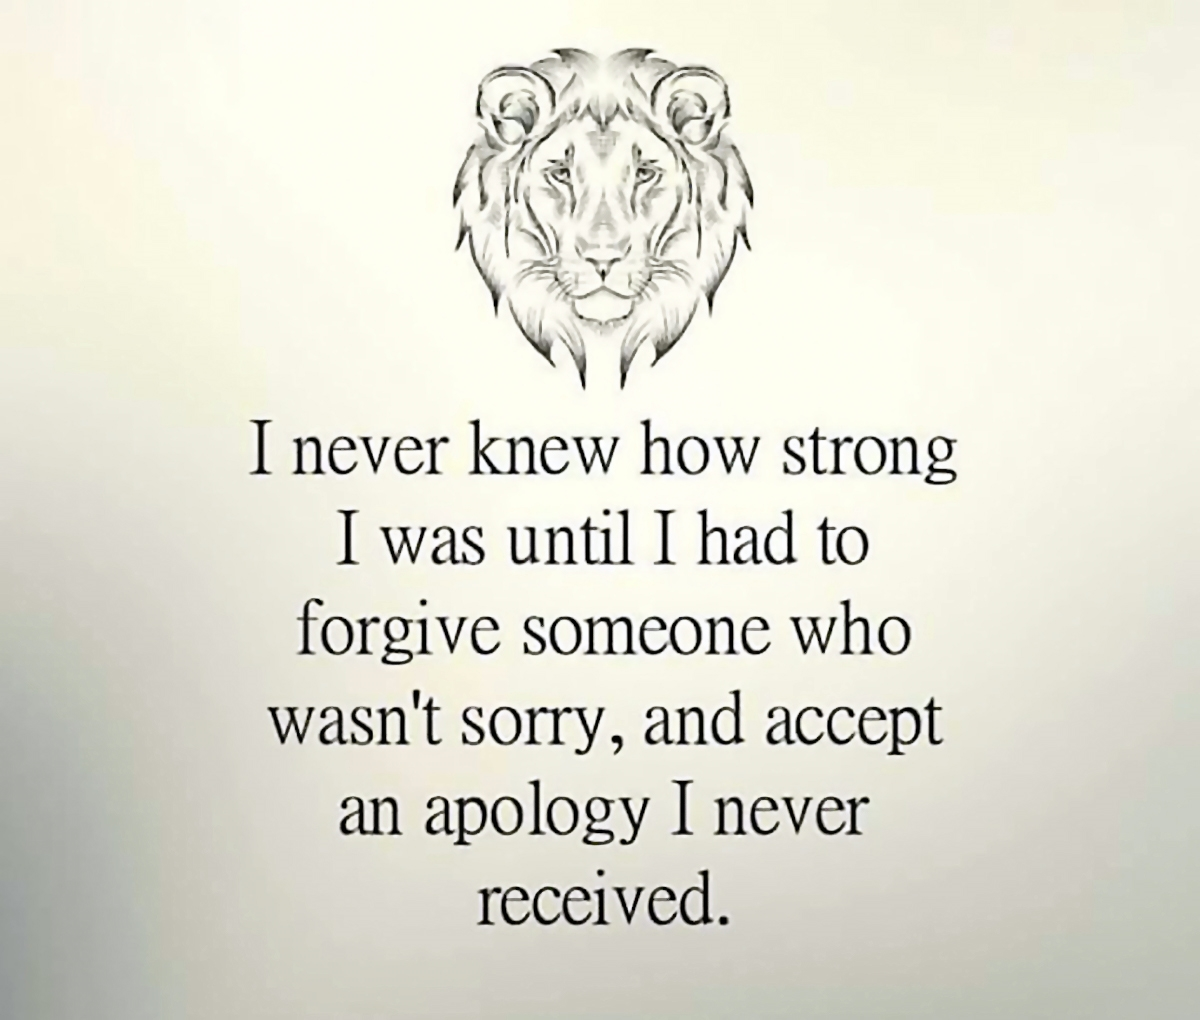 00 forgiveness 040516